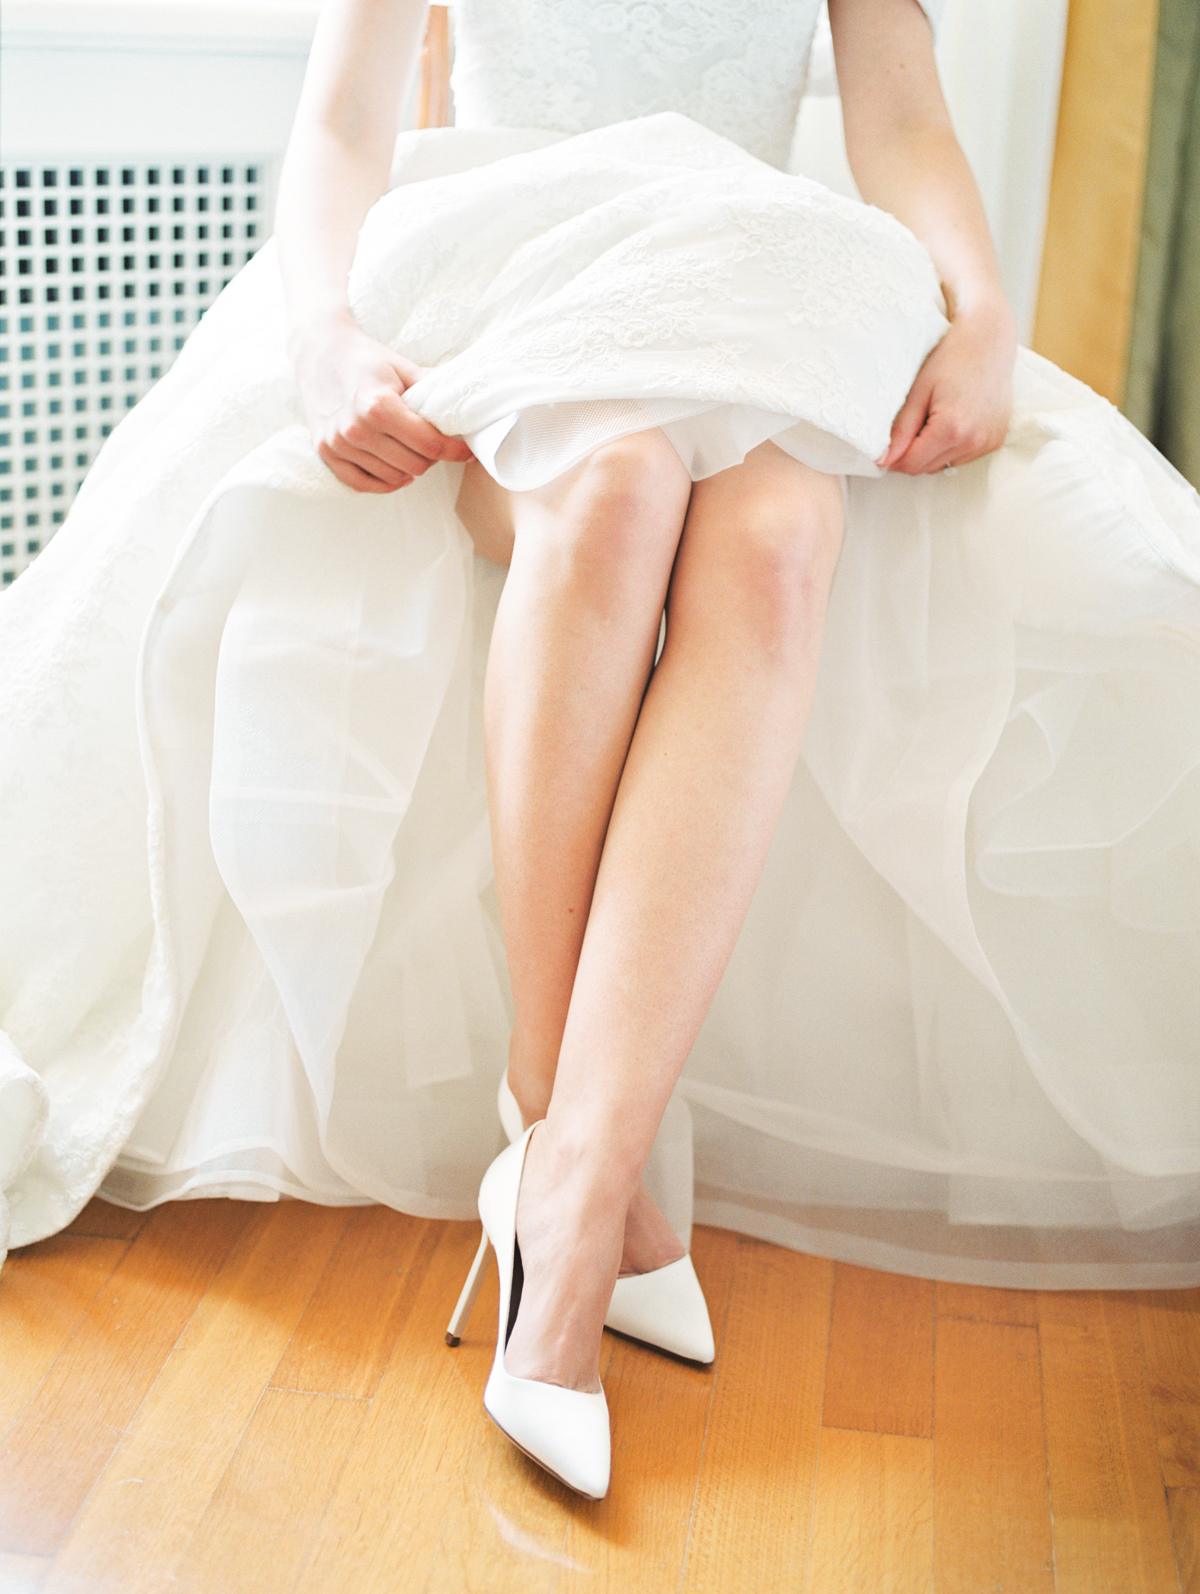 Palace_Villa_Cortine_Hotel_Italian_Wedding_Photographer_Sirmione_AKP-5.jpg